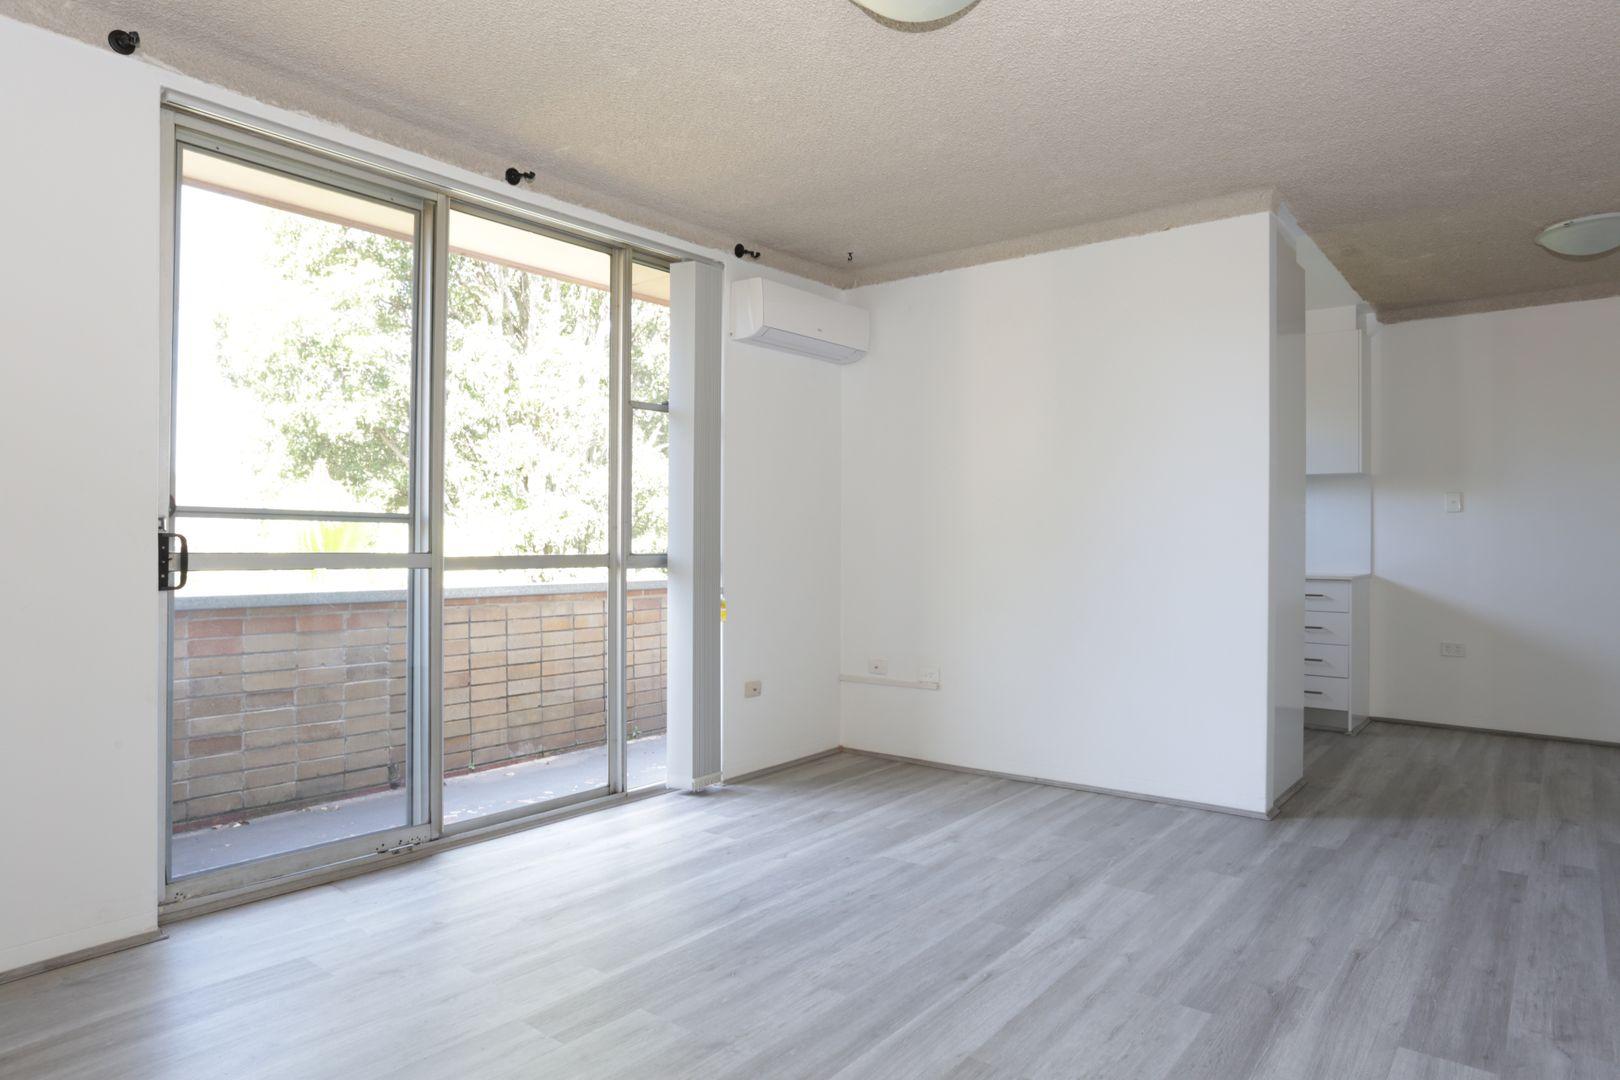 19/23 Ann Street, Merrylands NSW 2160, Image 1